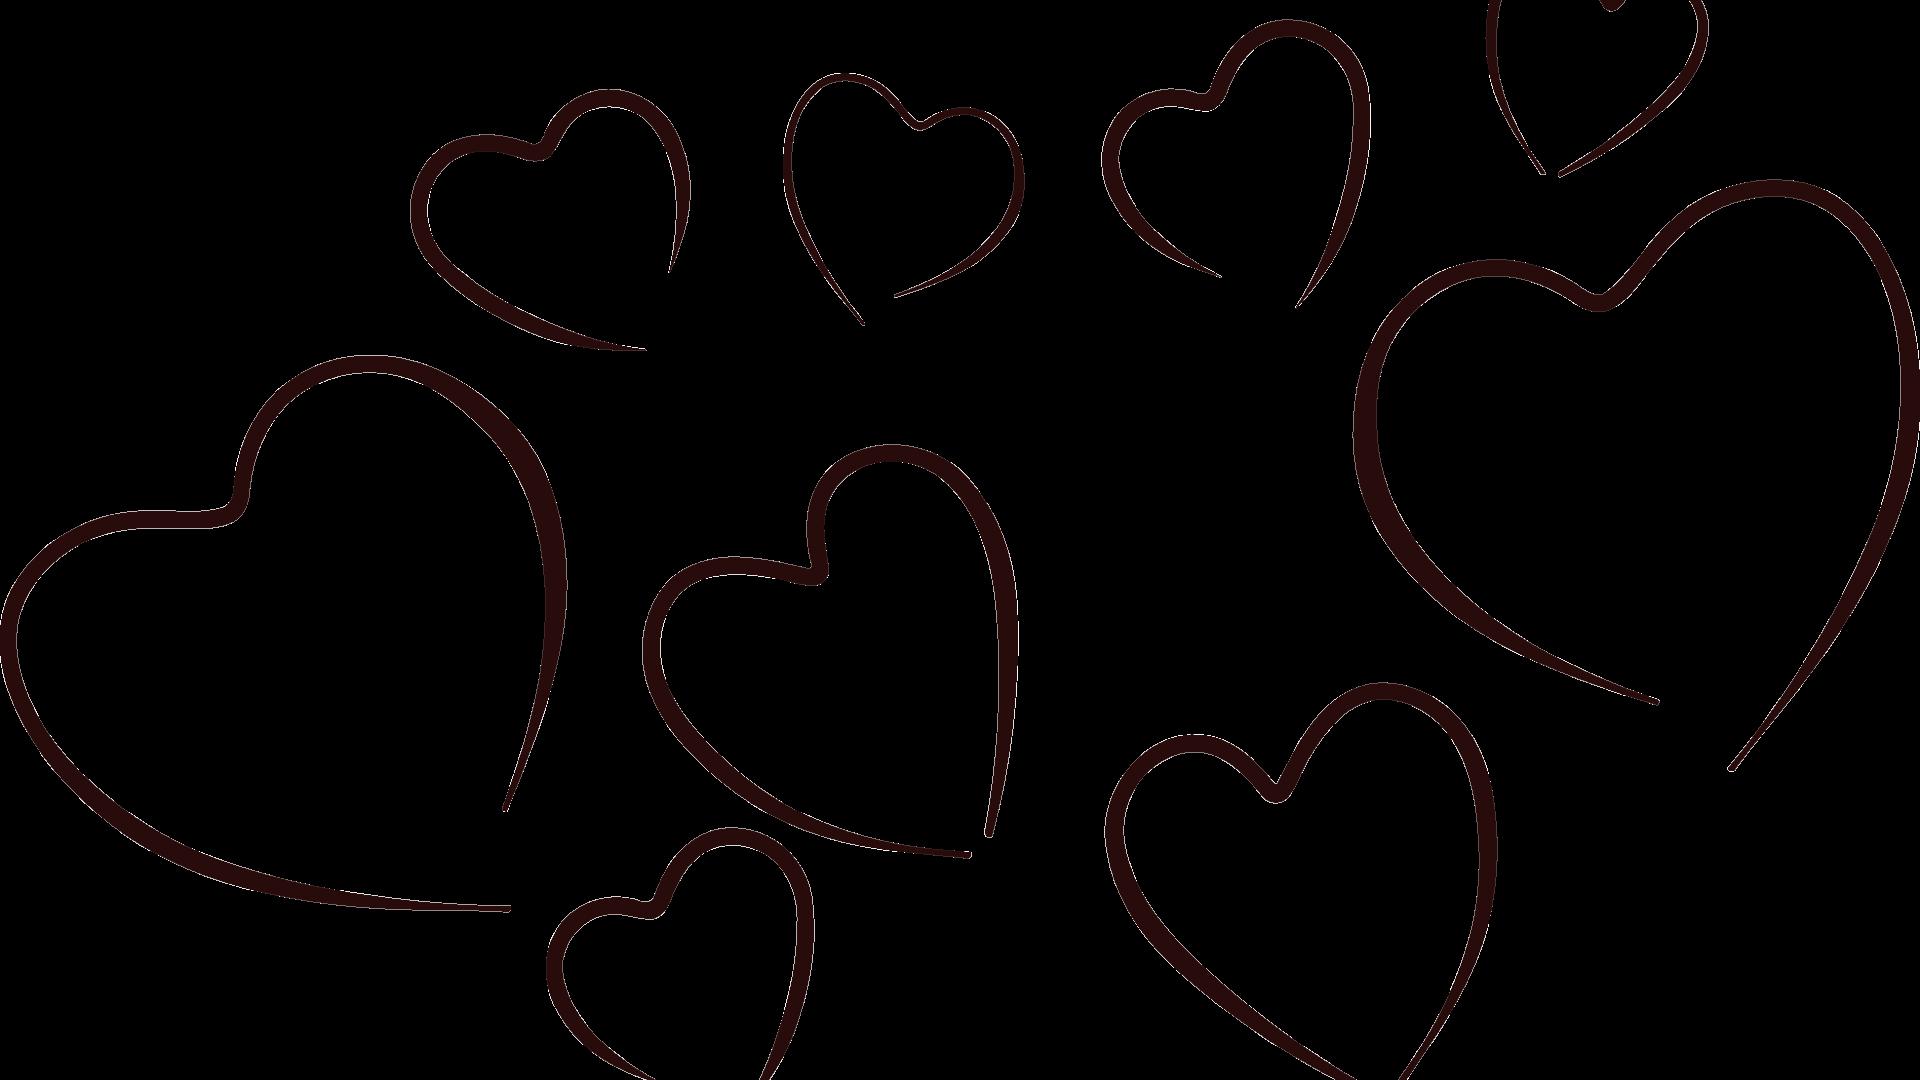 Heart x carwad net. Hearts clipart black and white